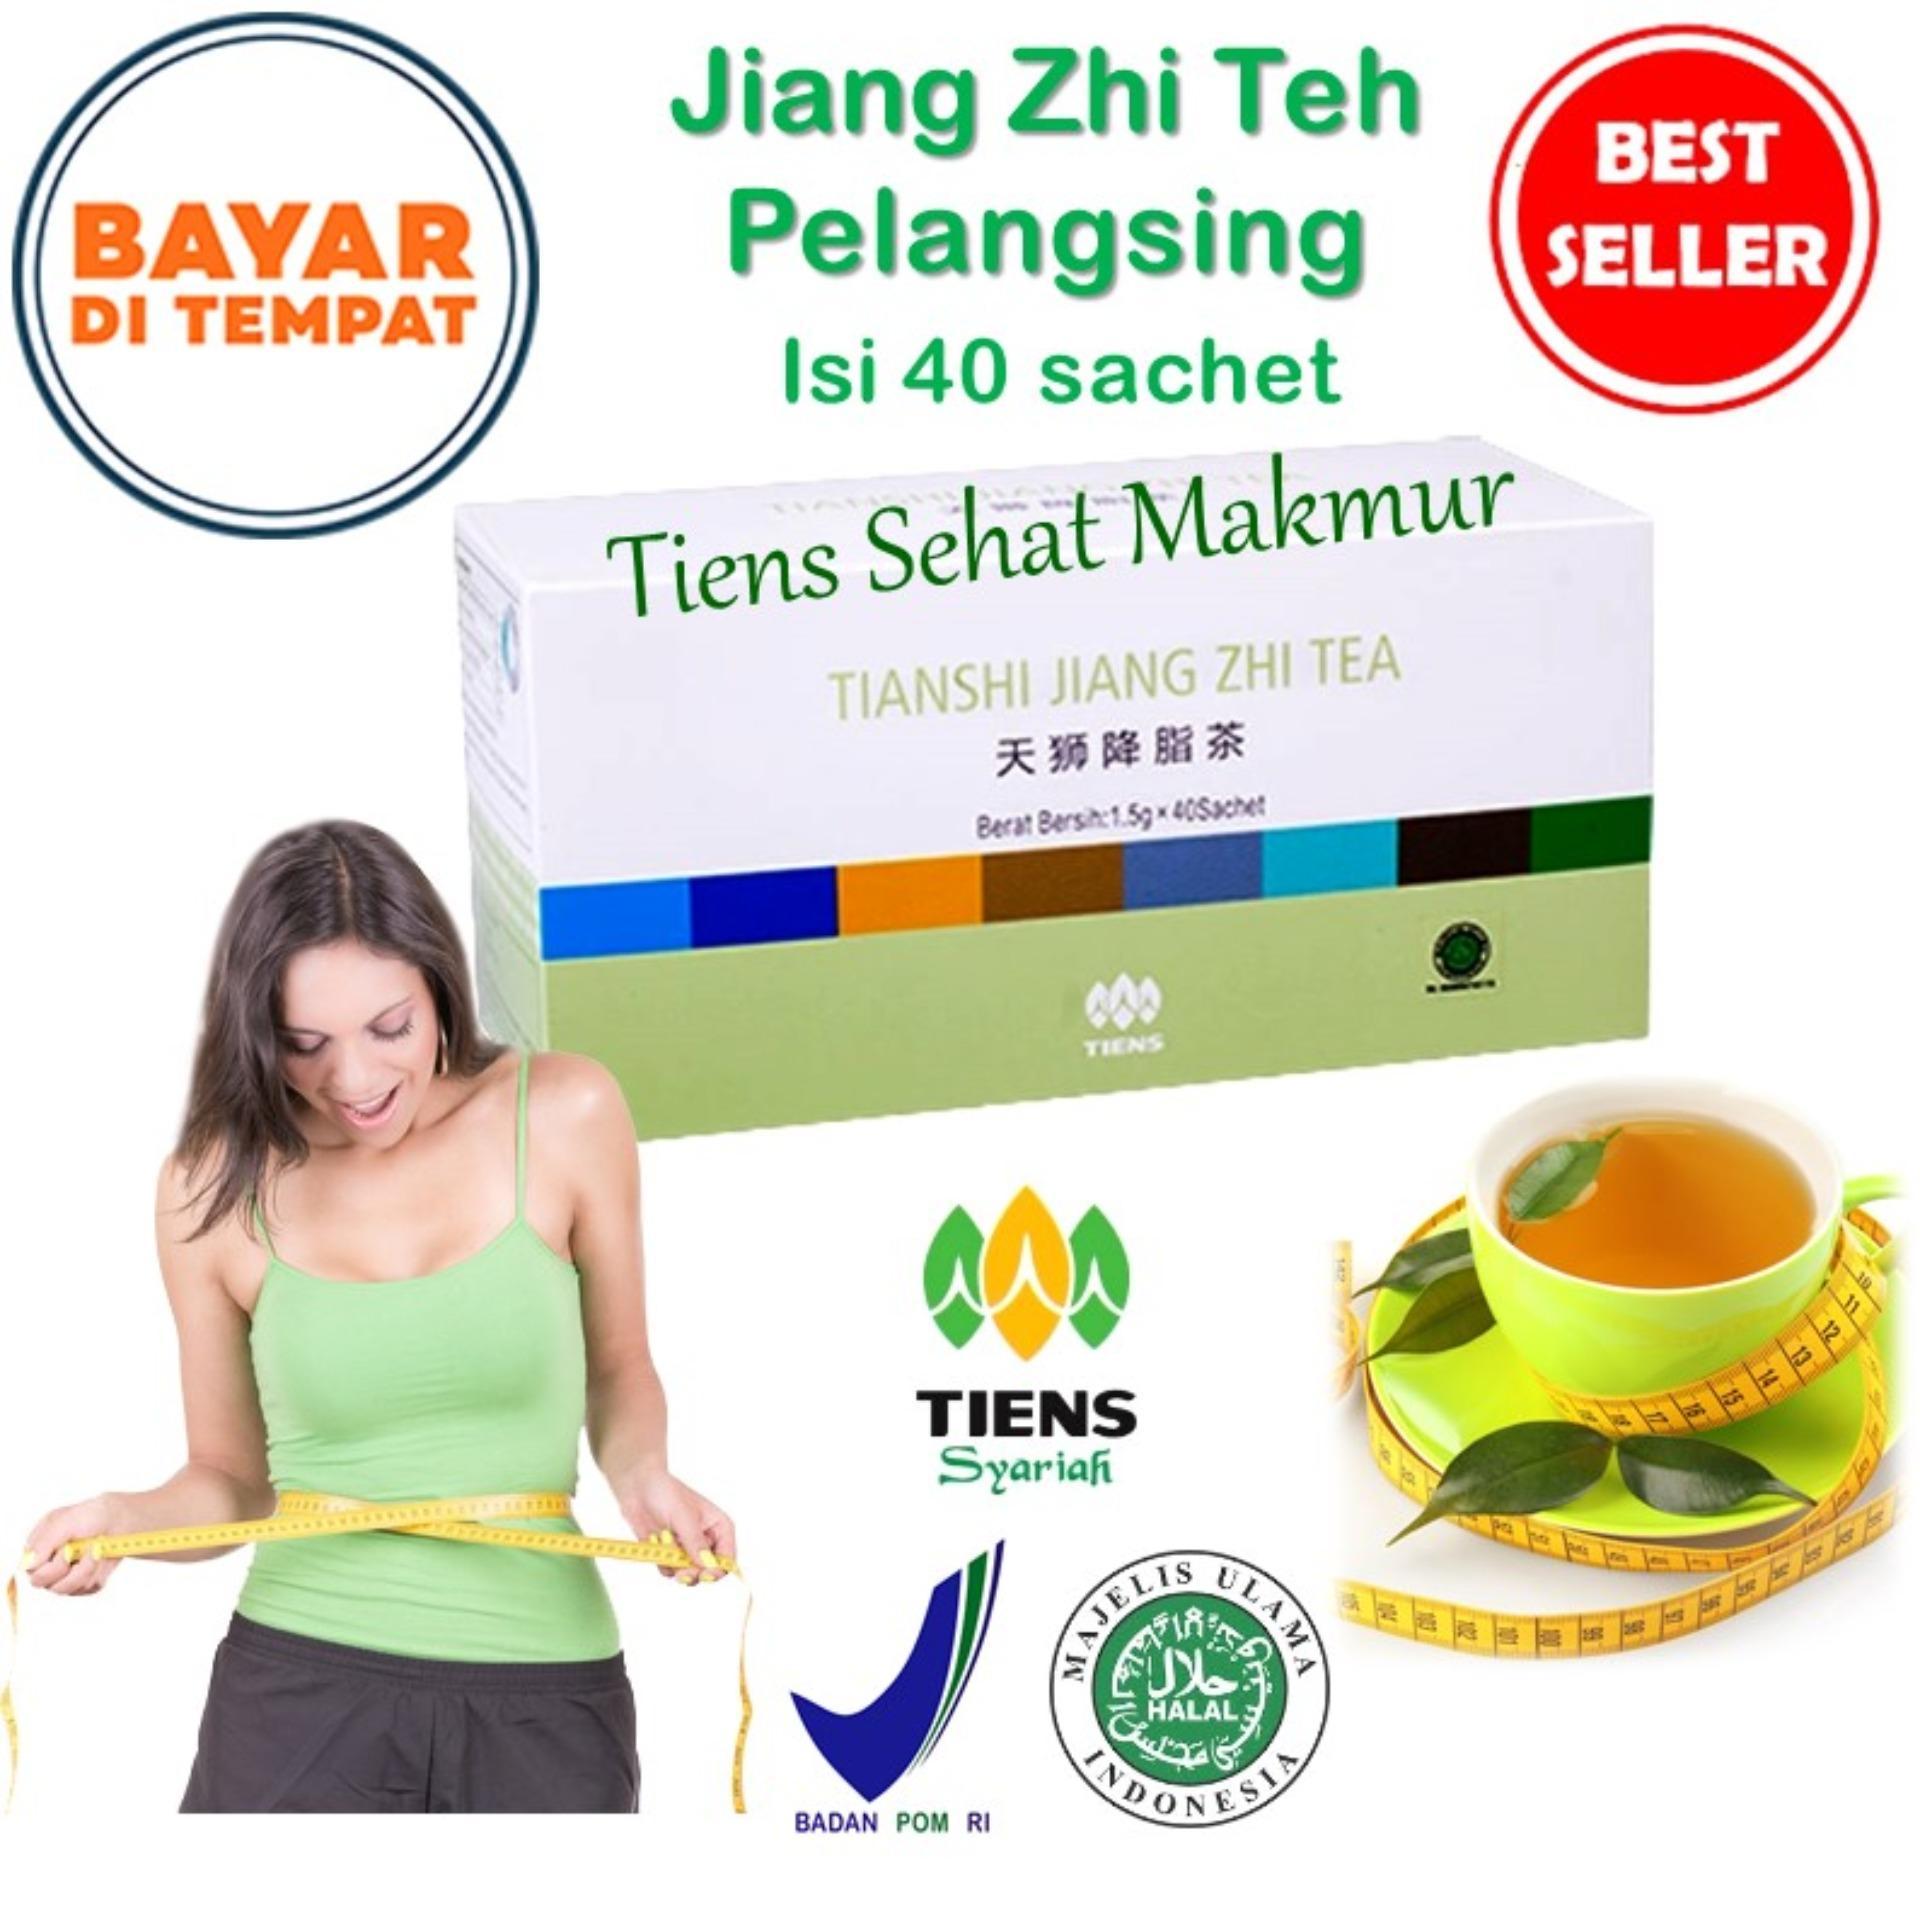 Tiens Teh hijau Jiang Zhi - isi 40 sachet Teh Diet  Teh Peluntur Lemak  Teh Penurun Berat Badan   S